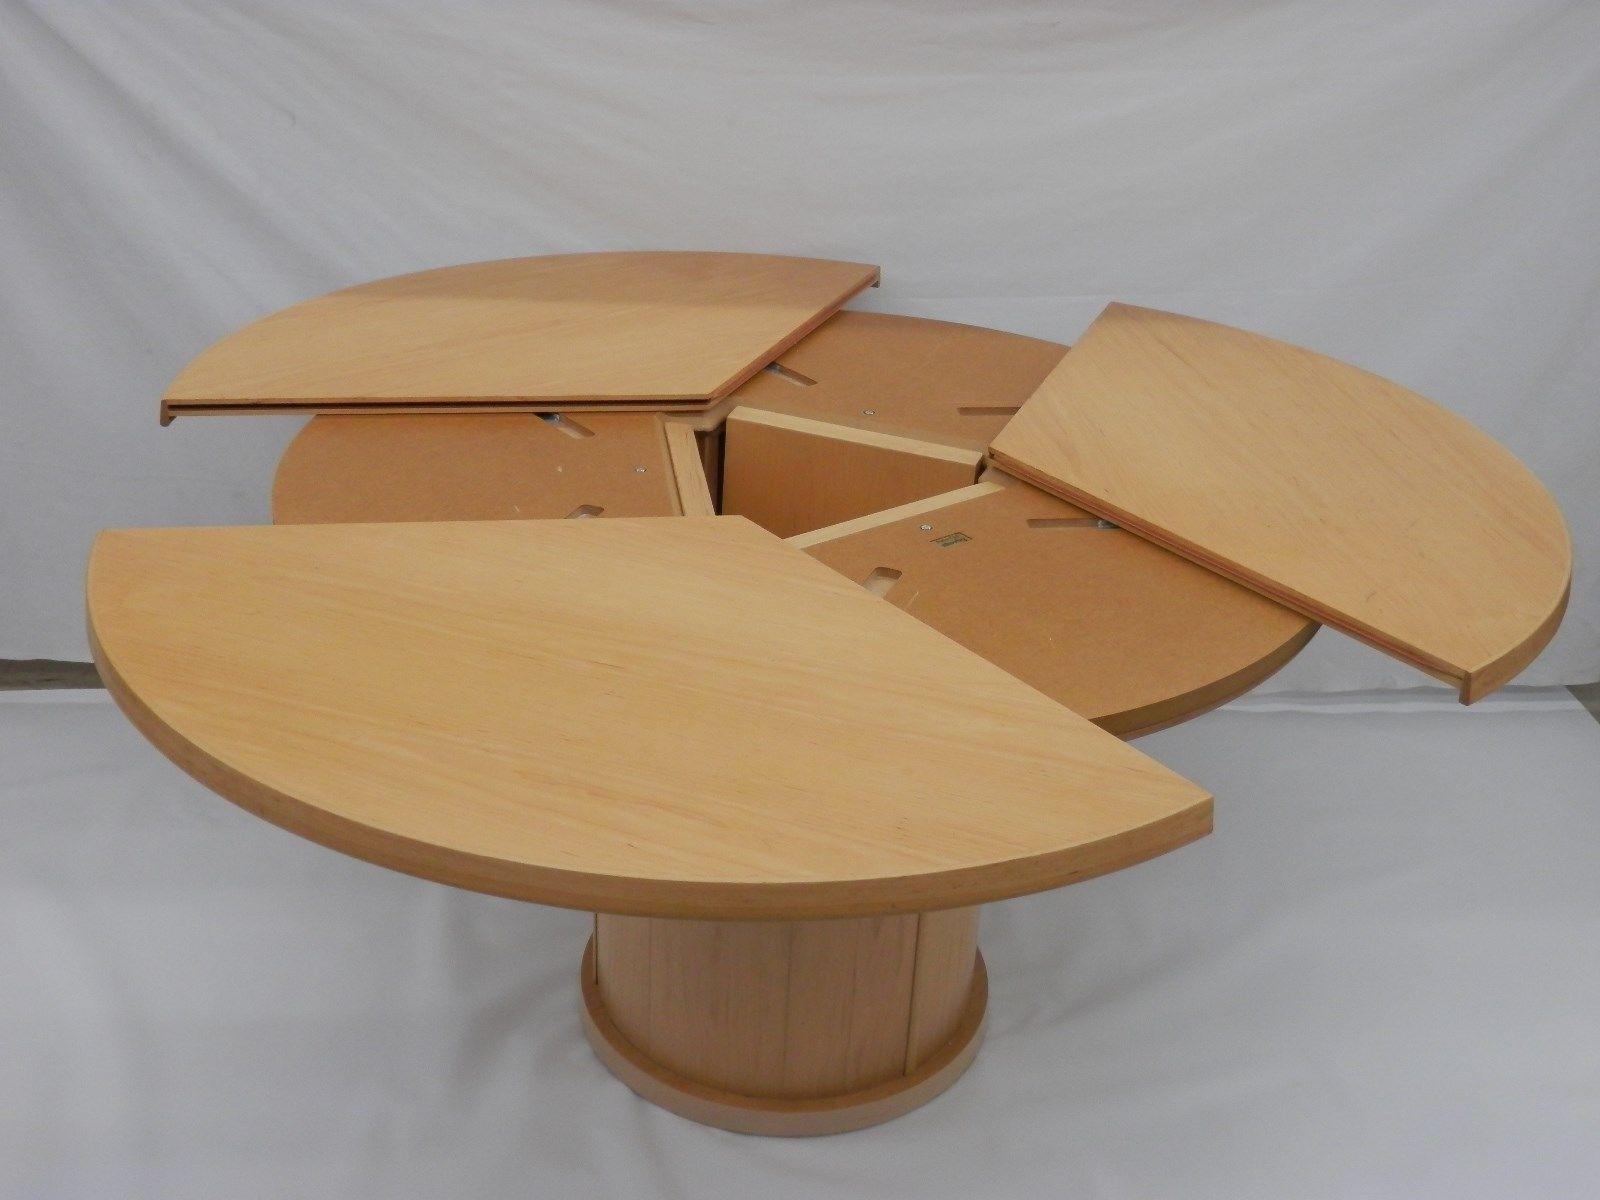 Фото круглого деревянного стола своими руками фото 235